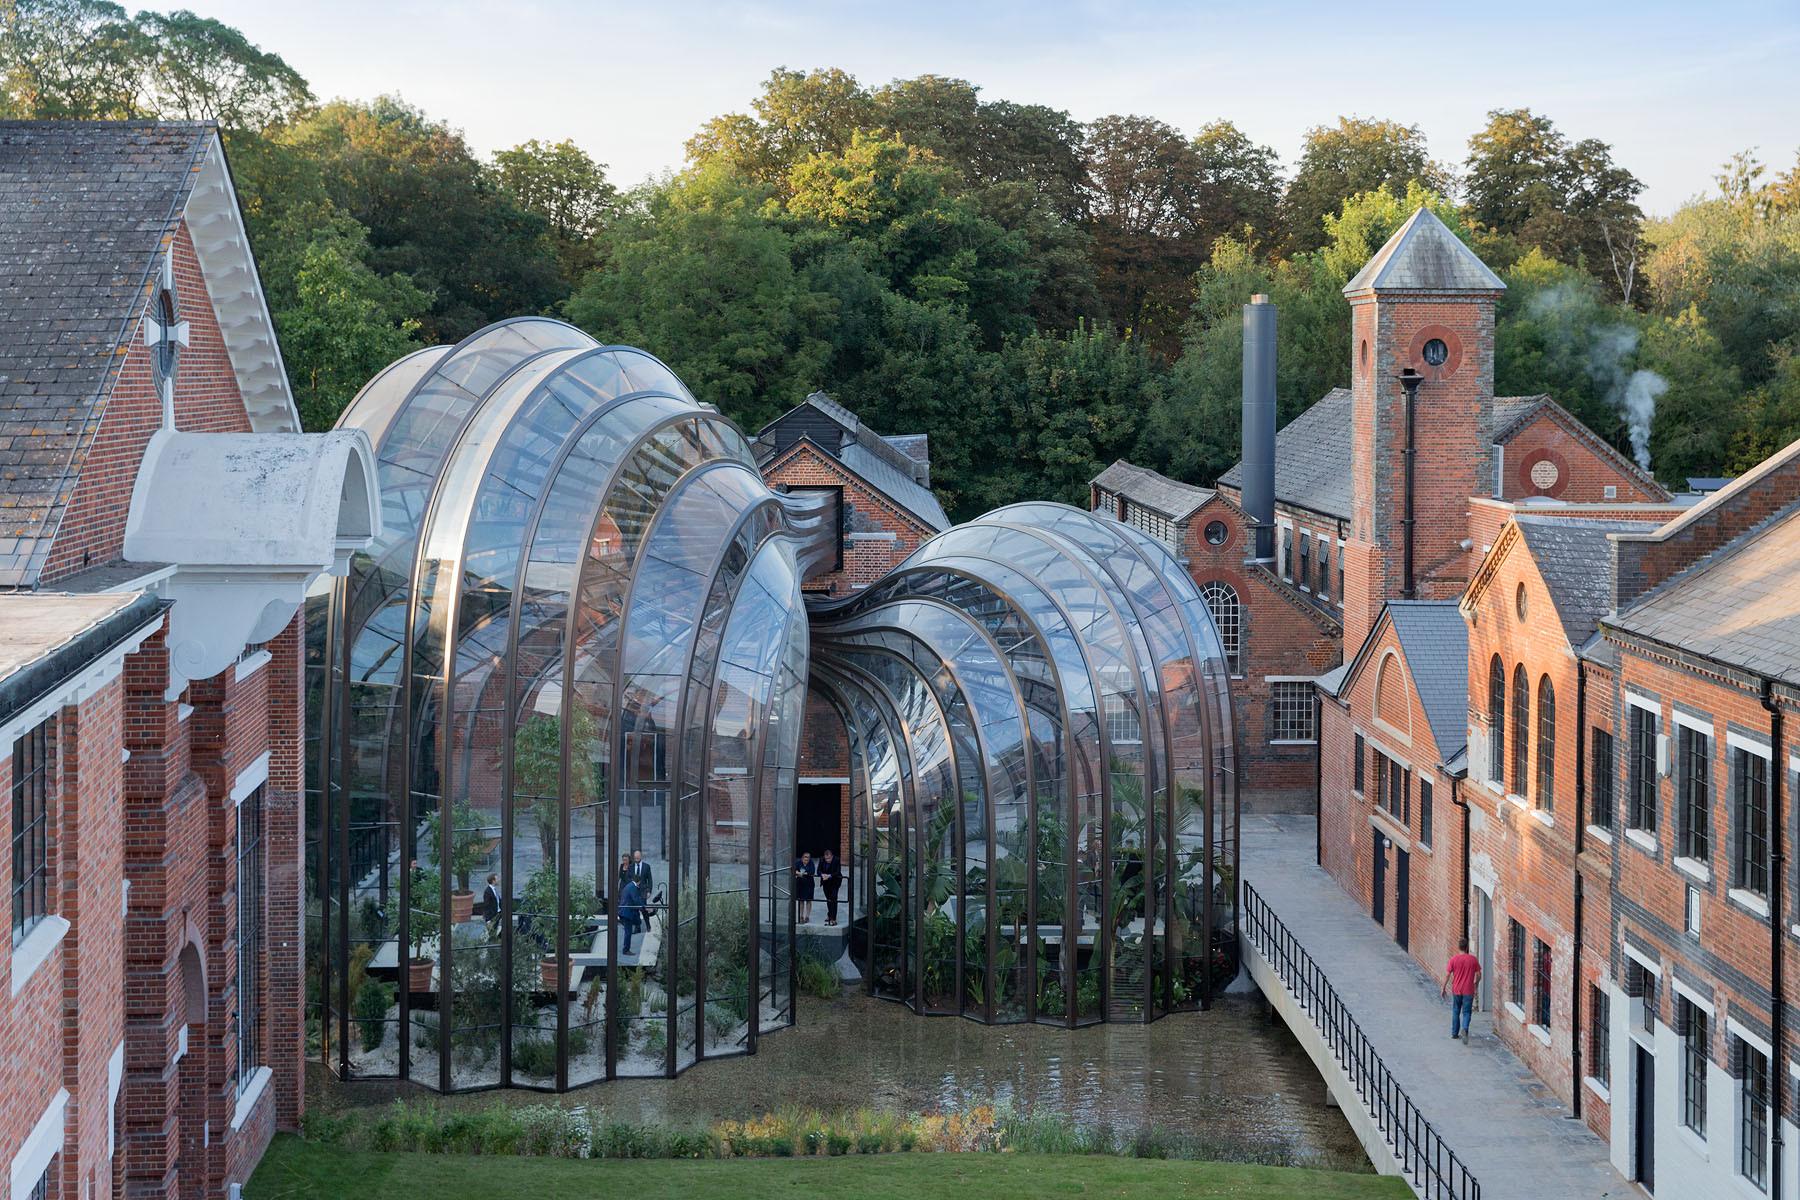 Bombay Sapphire Laverstoke Mill Distillery, Thomas Heatherwick; Hampshire. Imagen © Iwan Baan